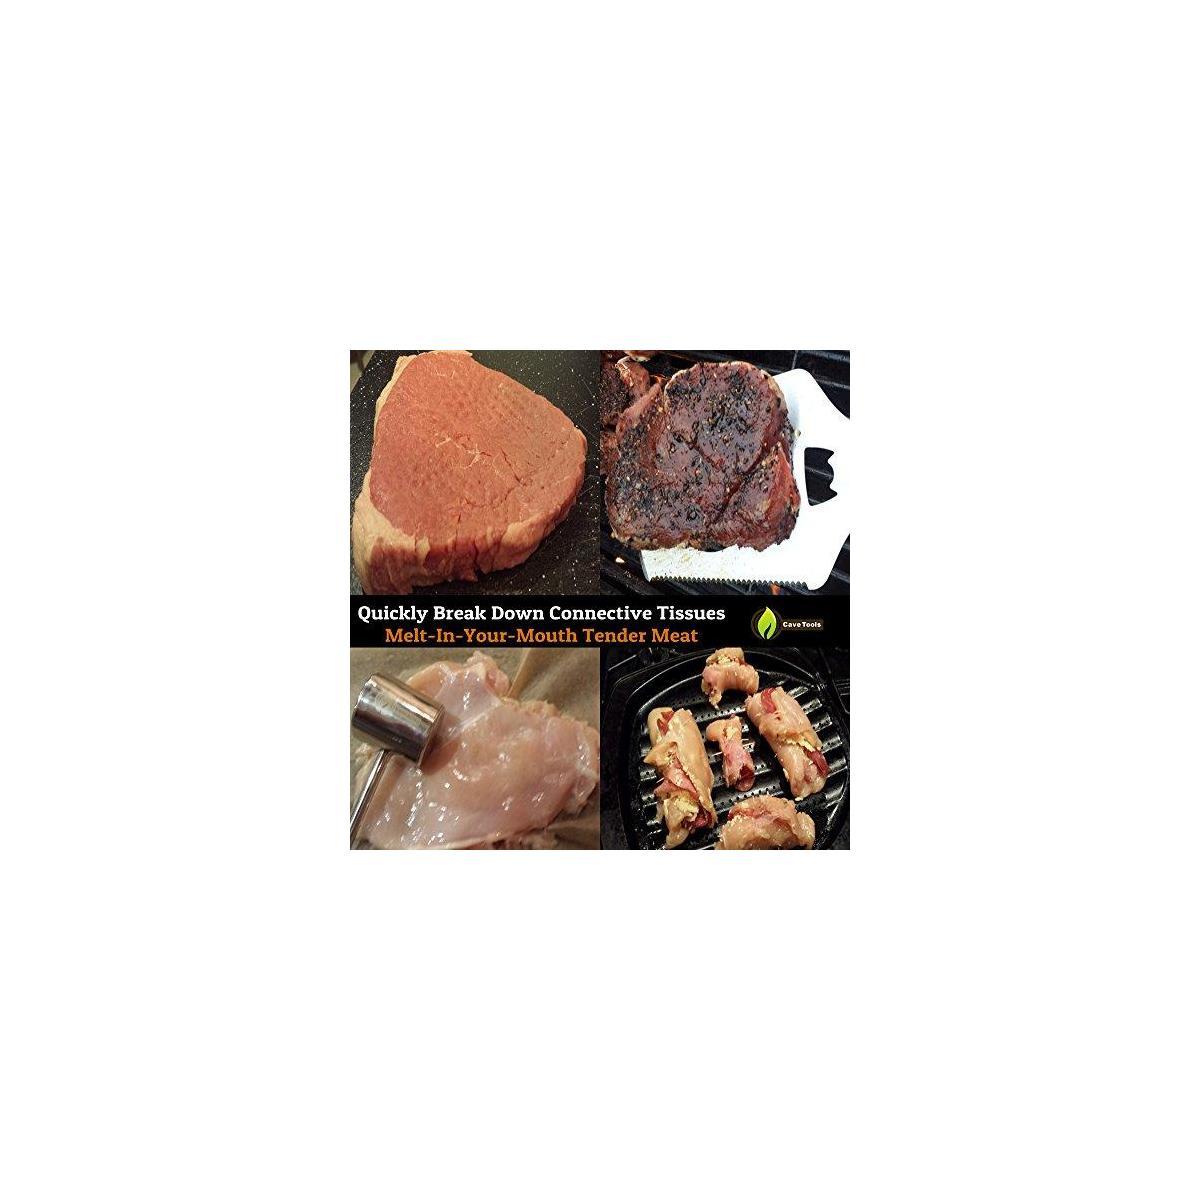 Veggie Grill Basket + Meat Tenderizer Mallet Tool - Dishwasher Safe & - Hammer Pounder for Tenderizing Chicken Steak Pork & Veal - Professional Non Slip Silicone Handle